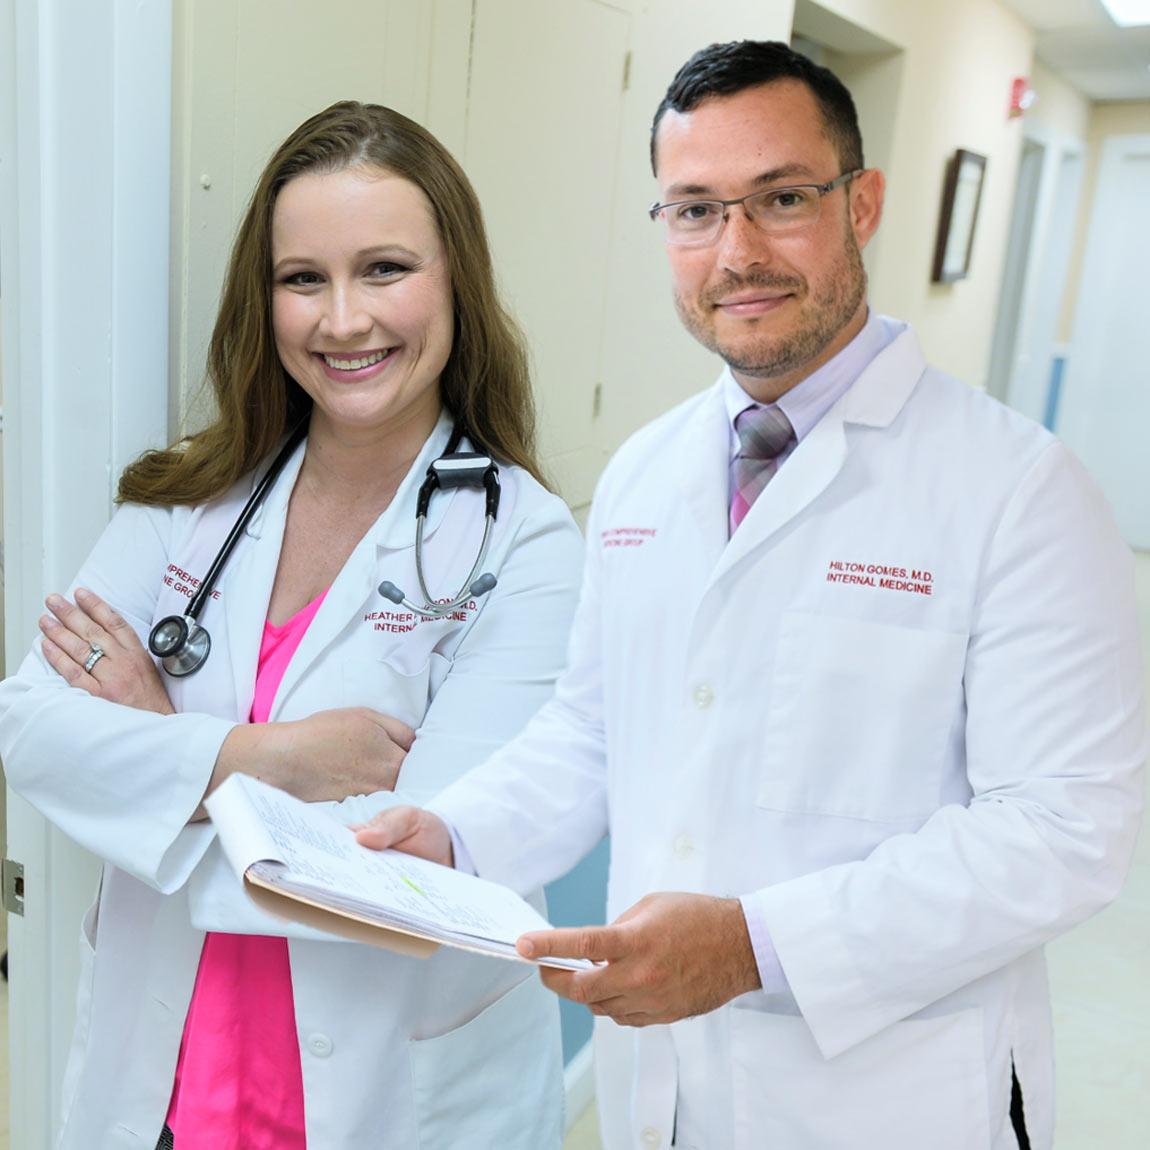 http://miamedicine.com/wp-content/uploads/2015/11/doctors-new.jpg